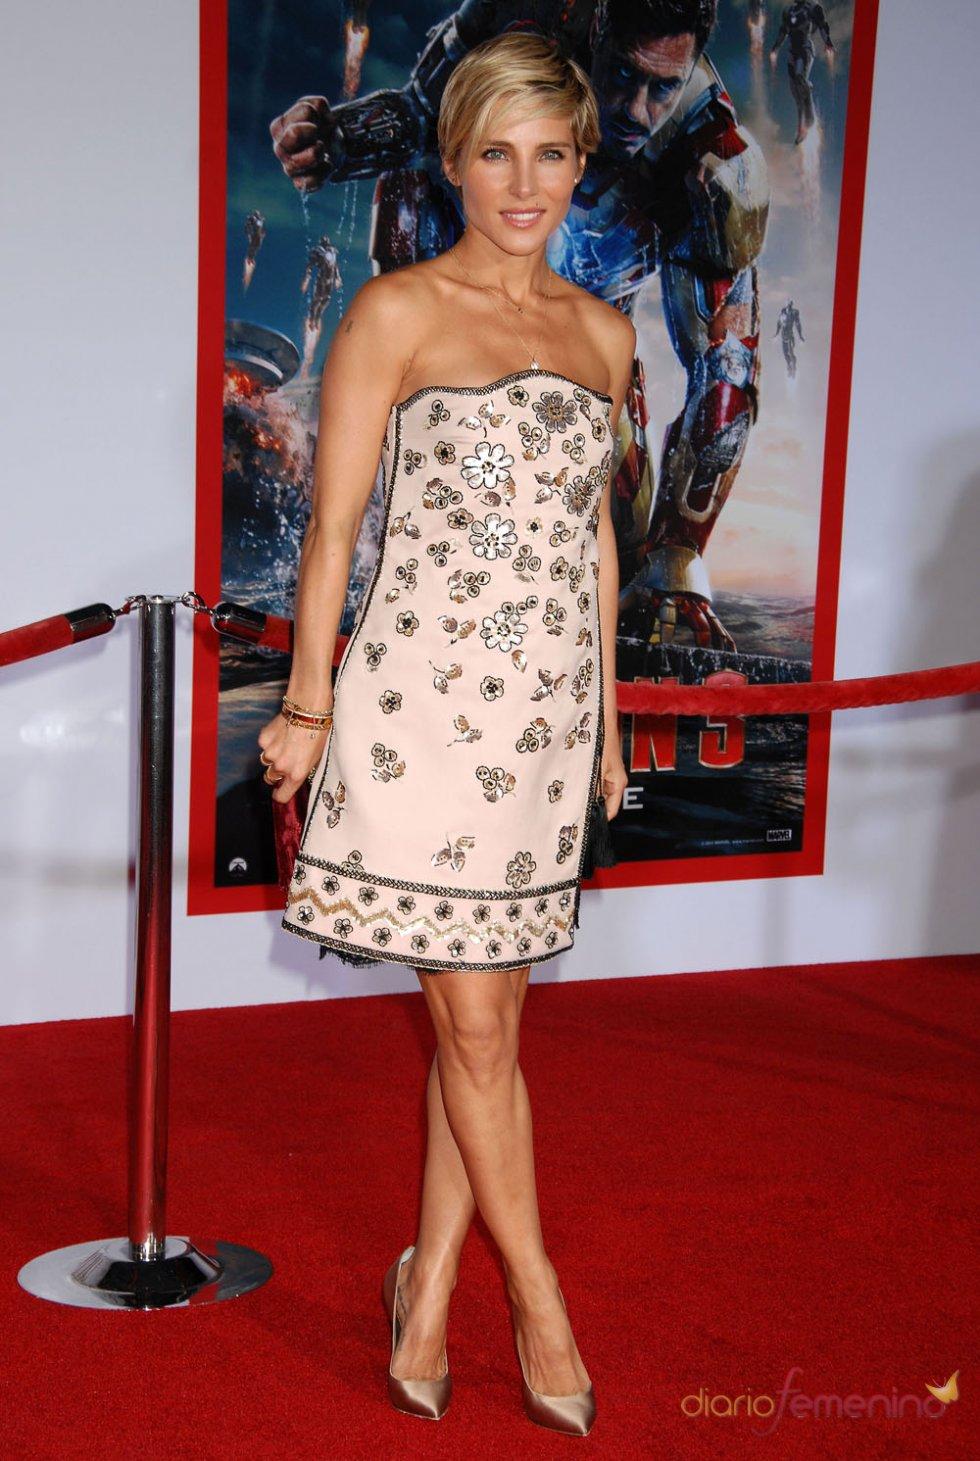 Elsa Pataky con un estilo veraniego durante la premier de 'Iron Man 3'